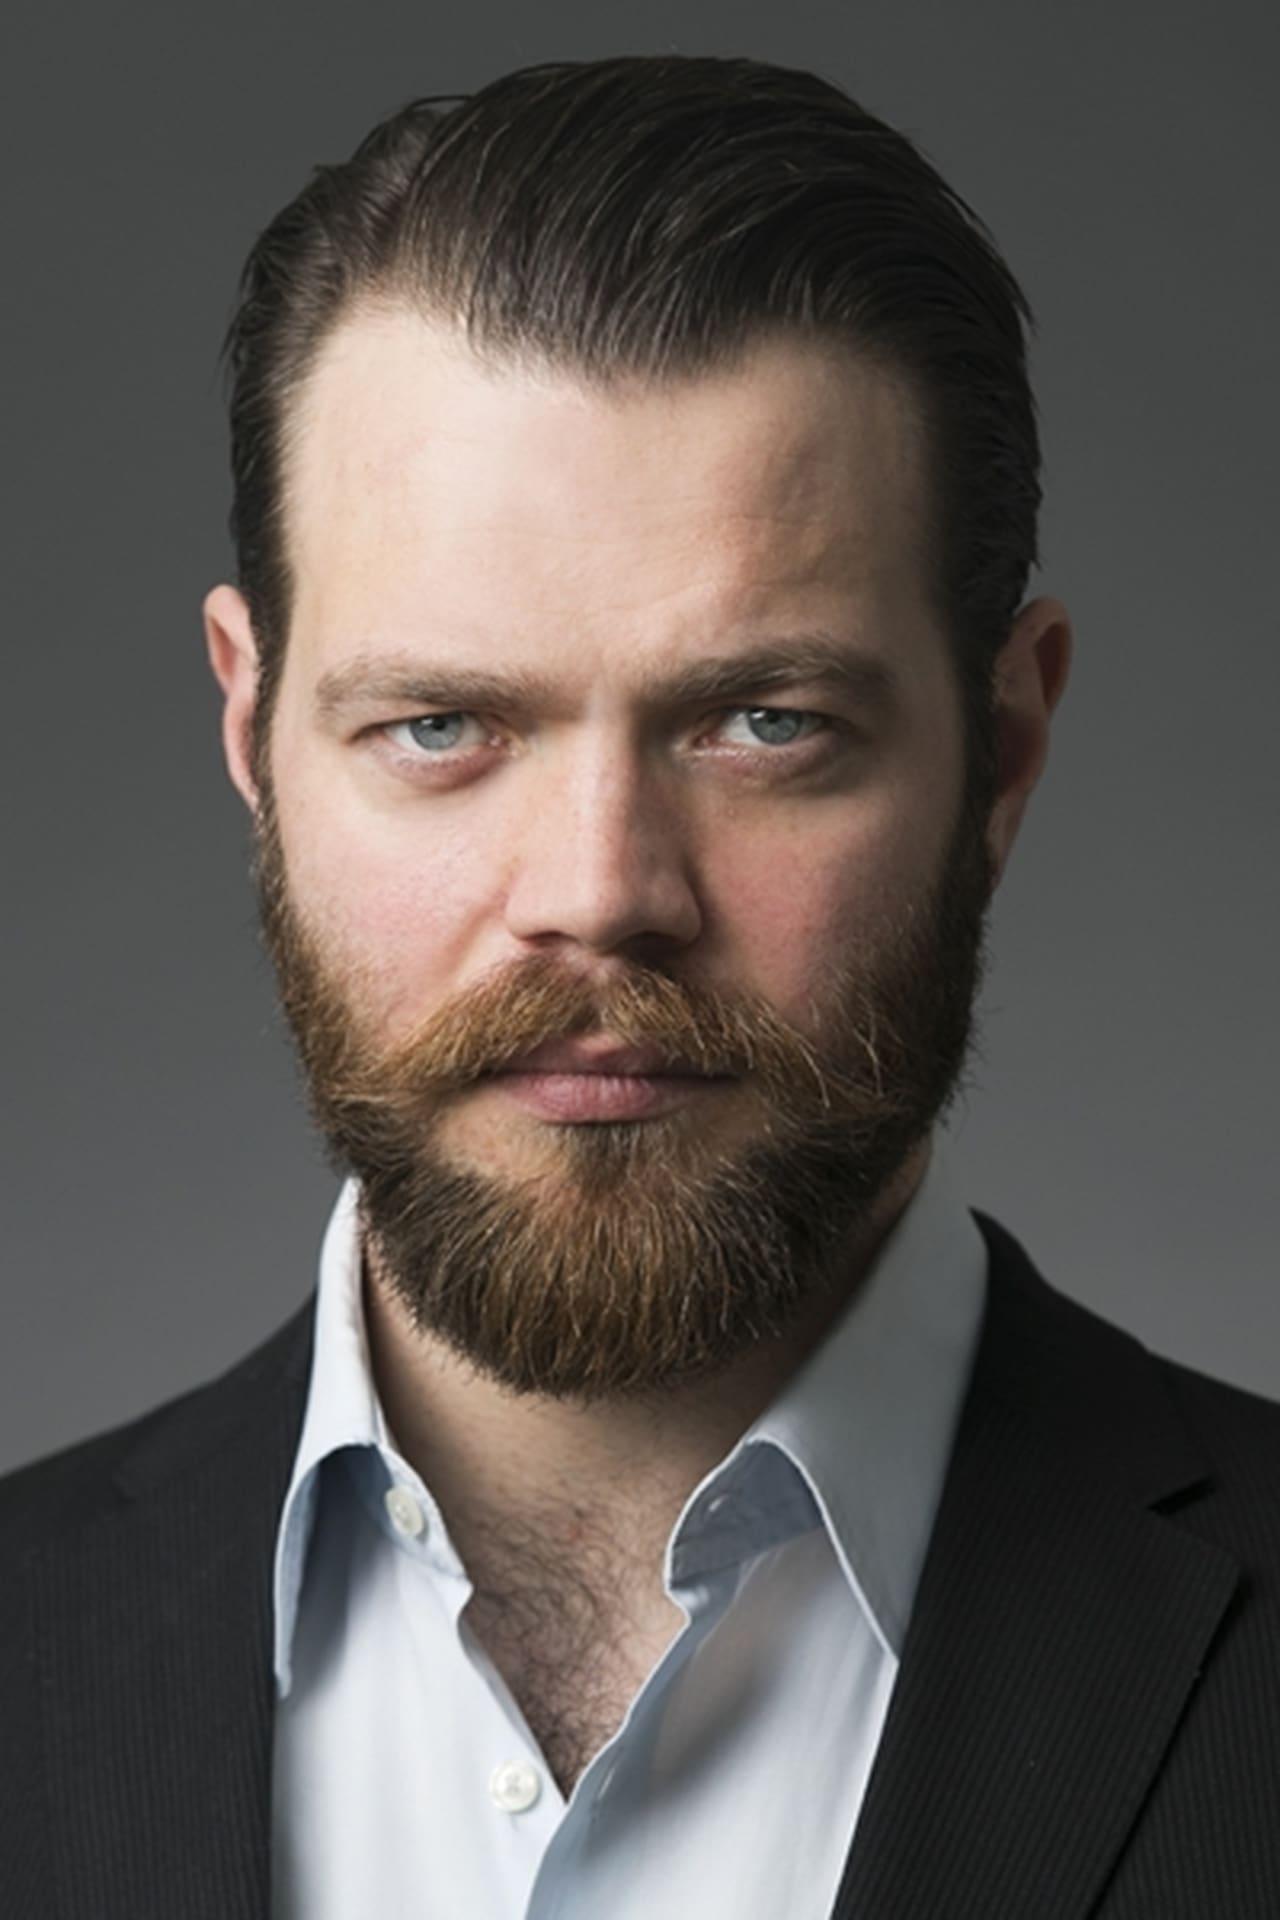 Jóhannes Haukur Jóhannesson isTau